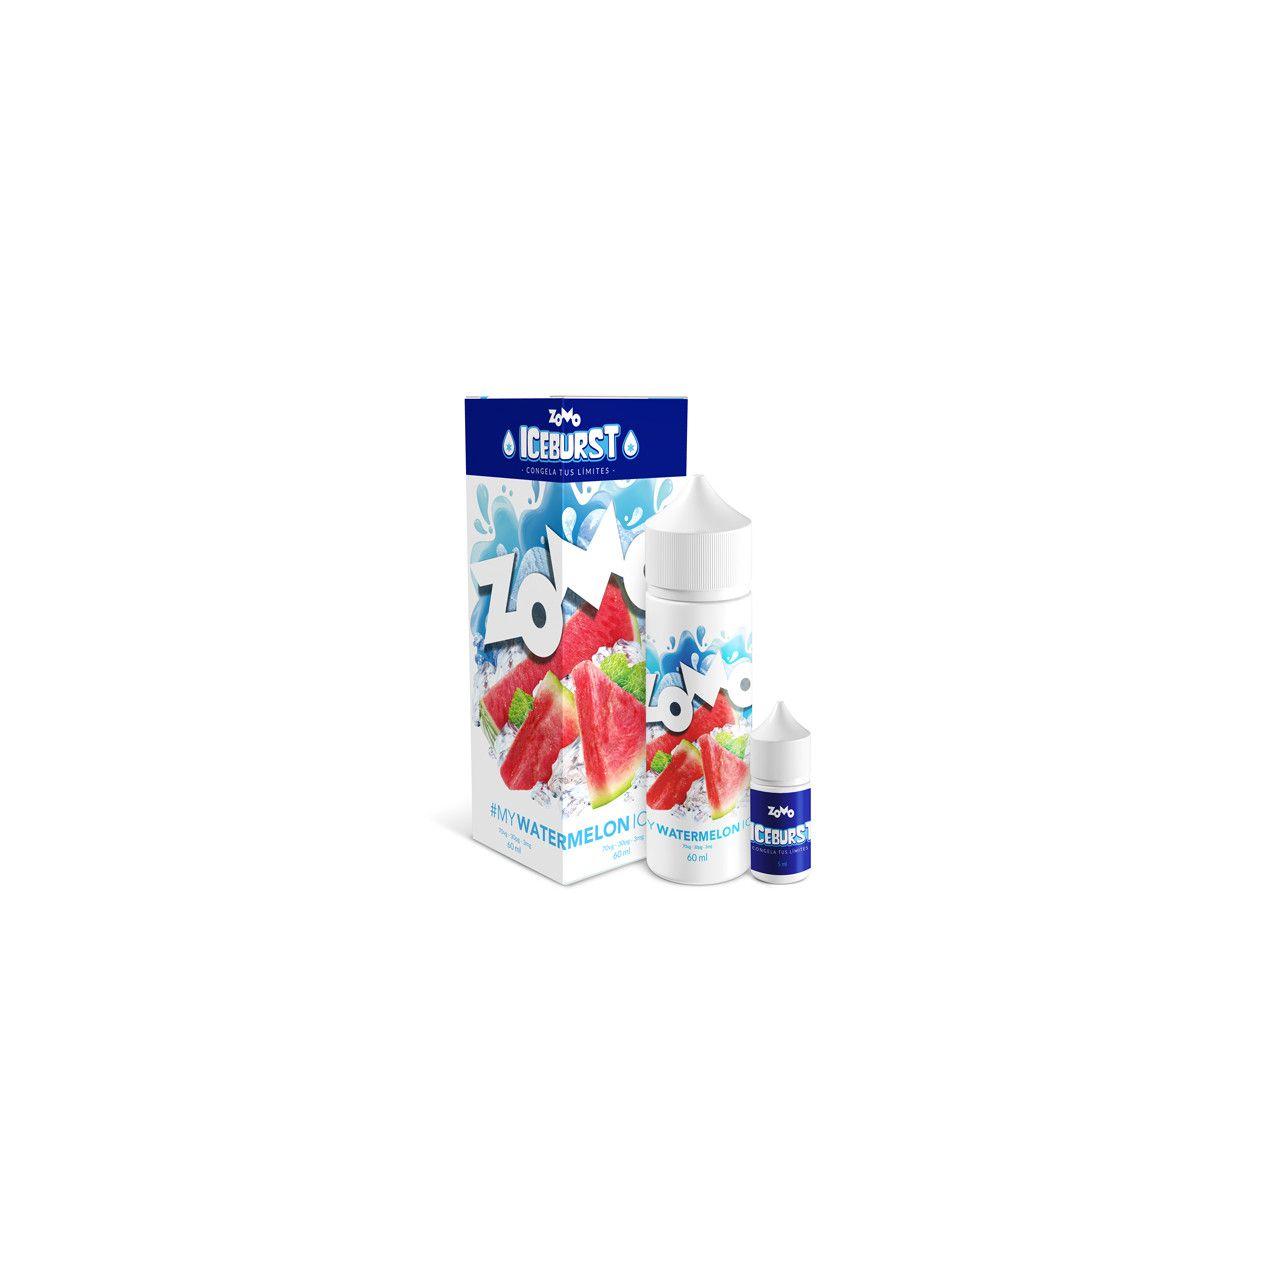 Líquido (Juice) - Watermelon - Iceburst - Zomo Vape